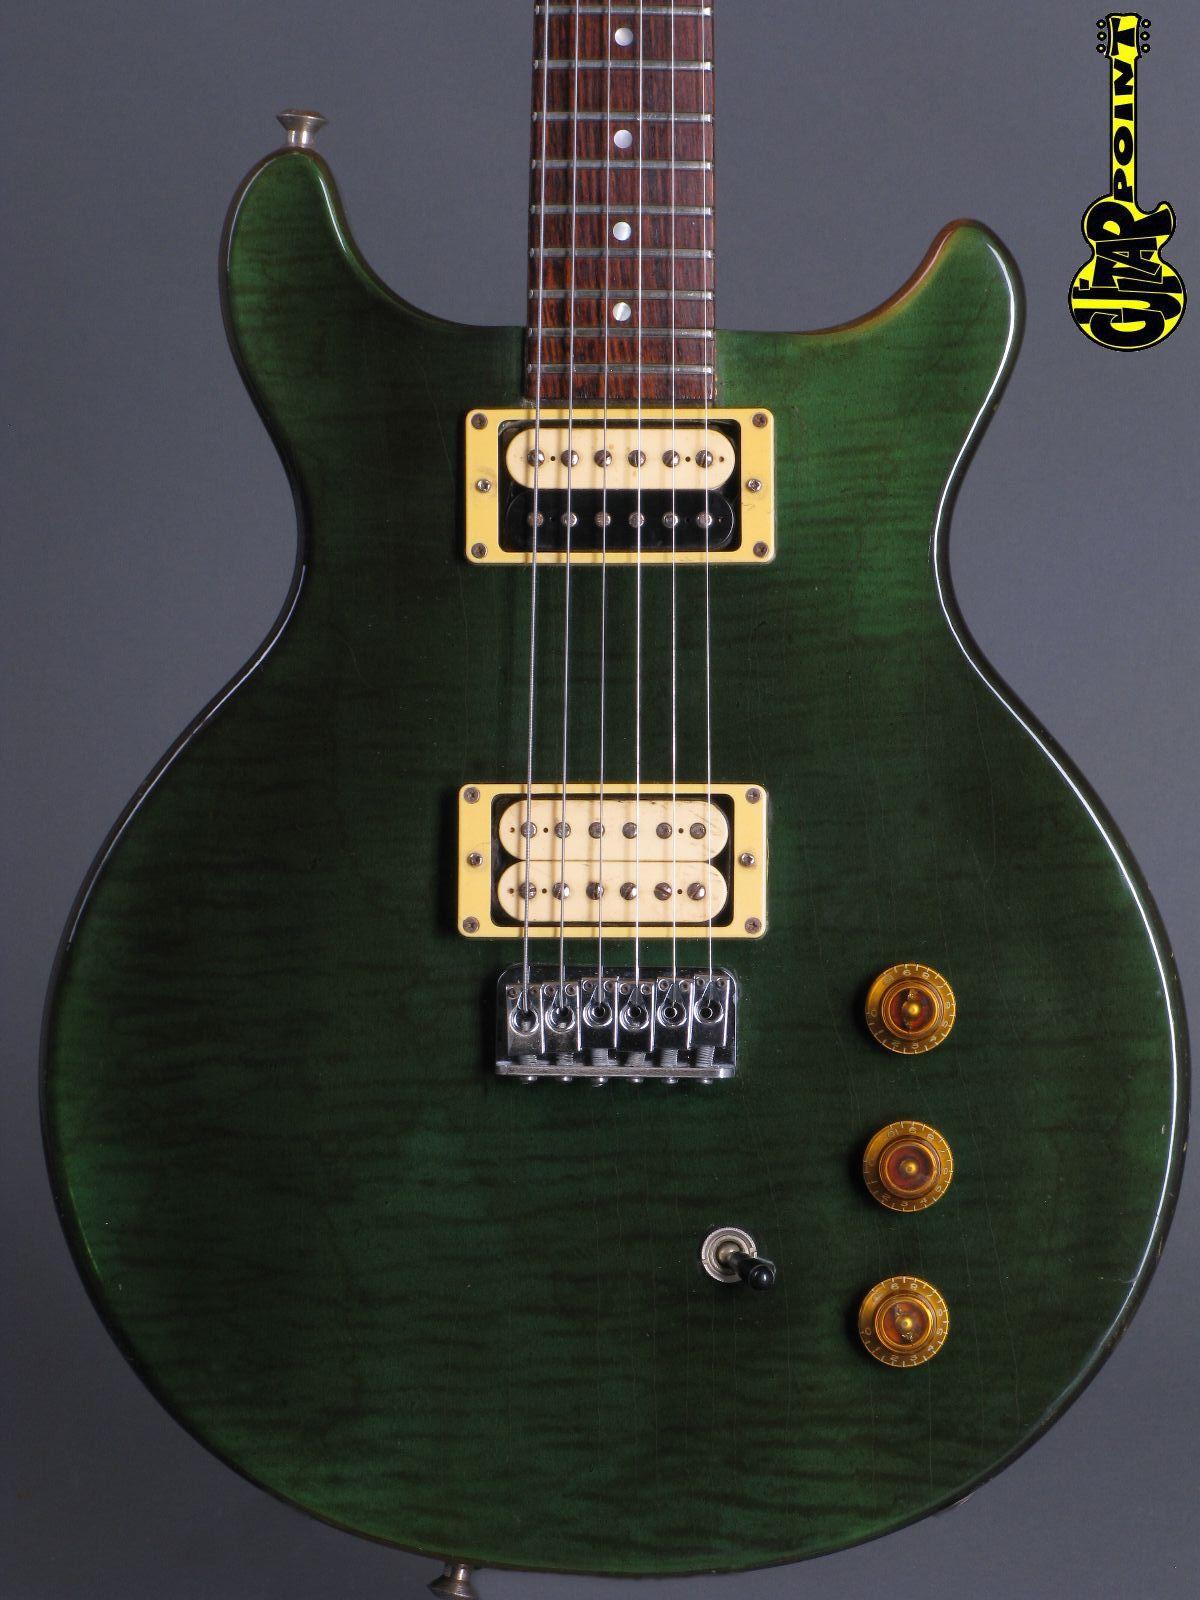 1980 Hamer Special - Greenburst